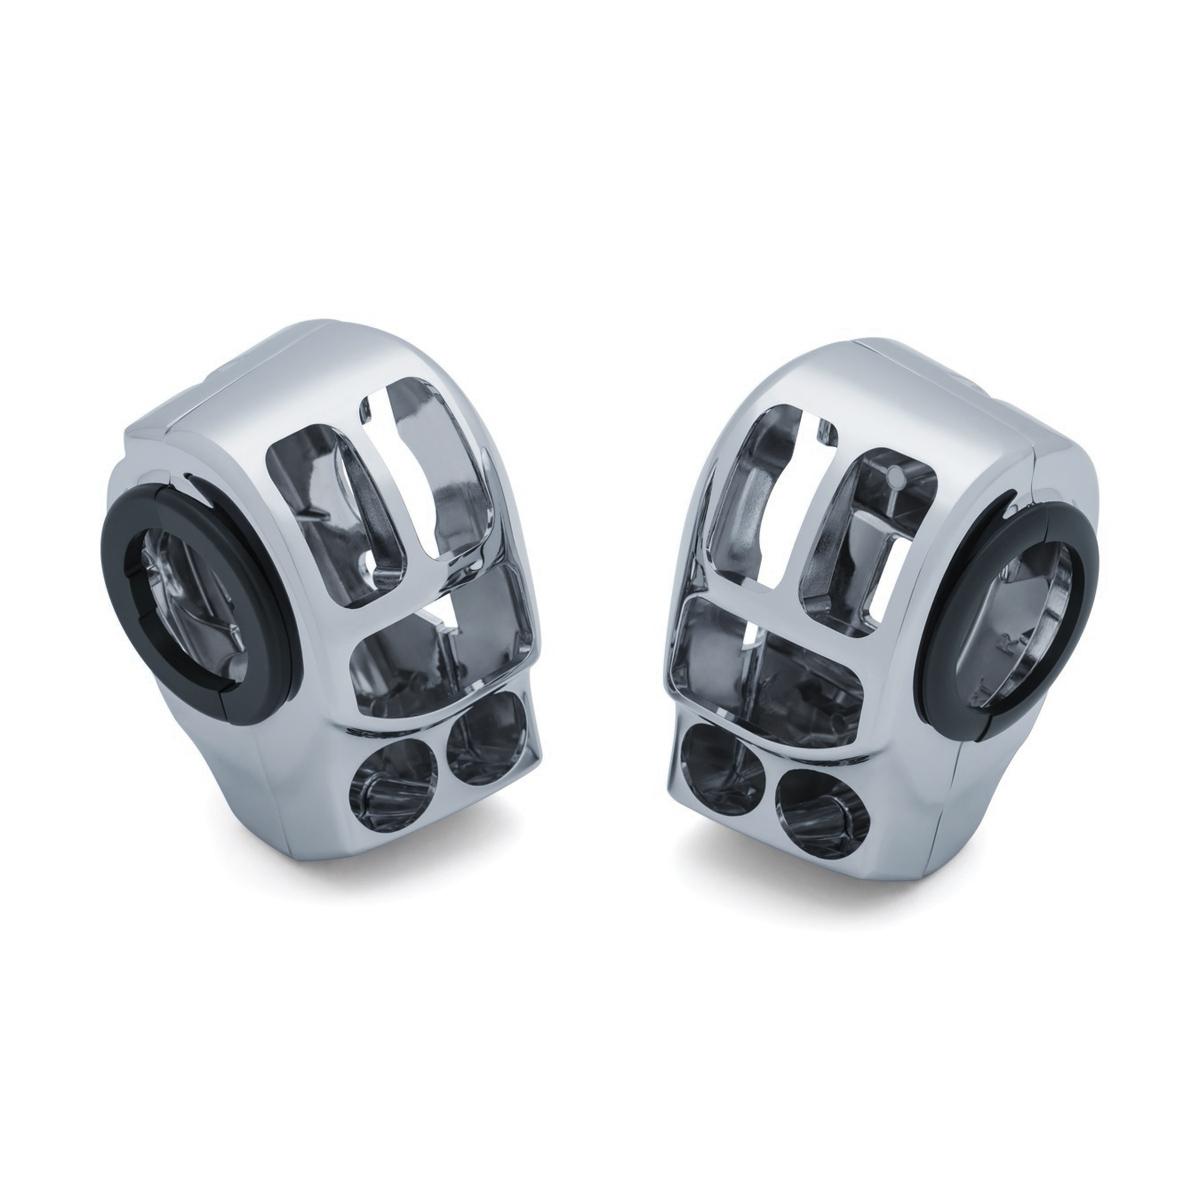 Handlebar Controls Jp Cycles Wire Harness For A 73 Ironhead Kuryakyn Chrome Switch Housings